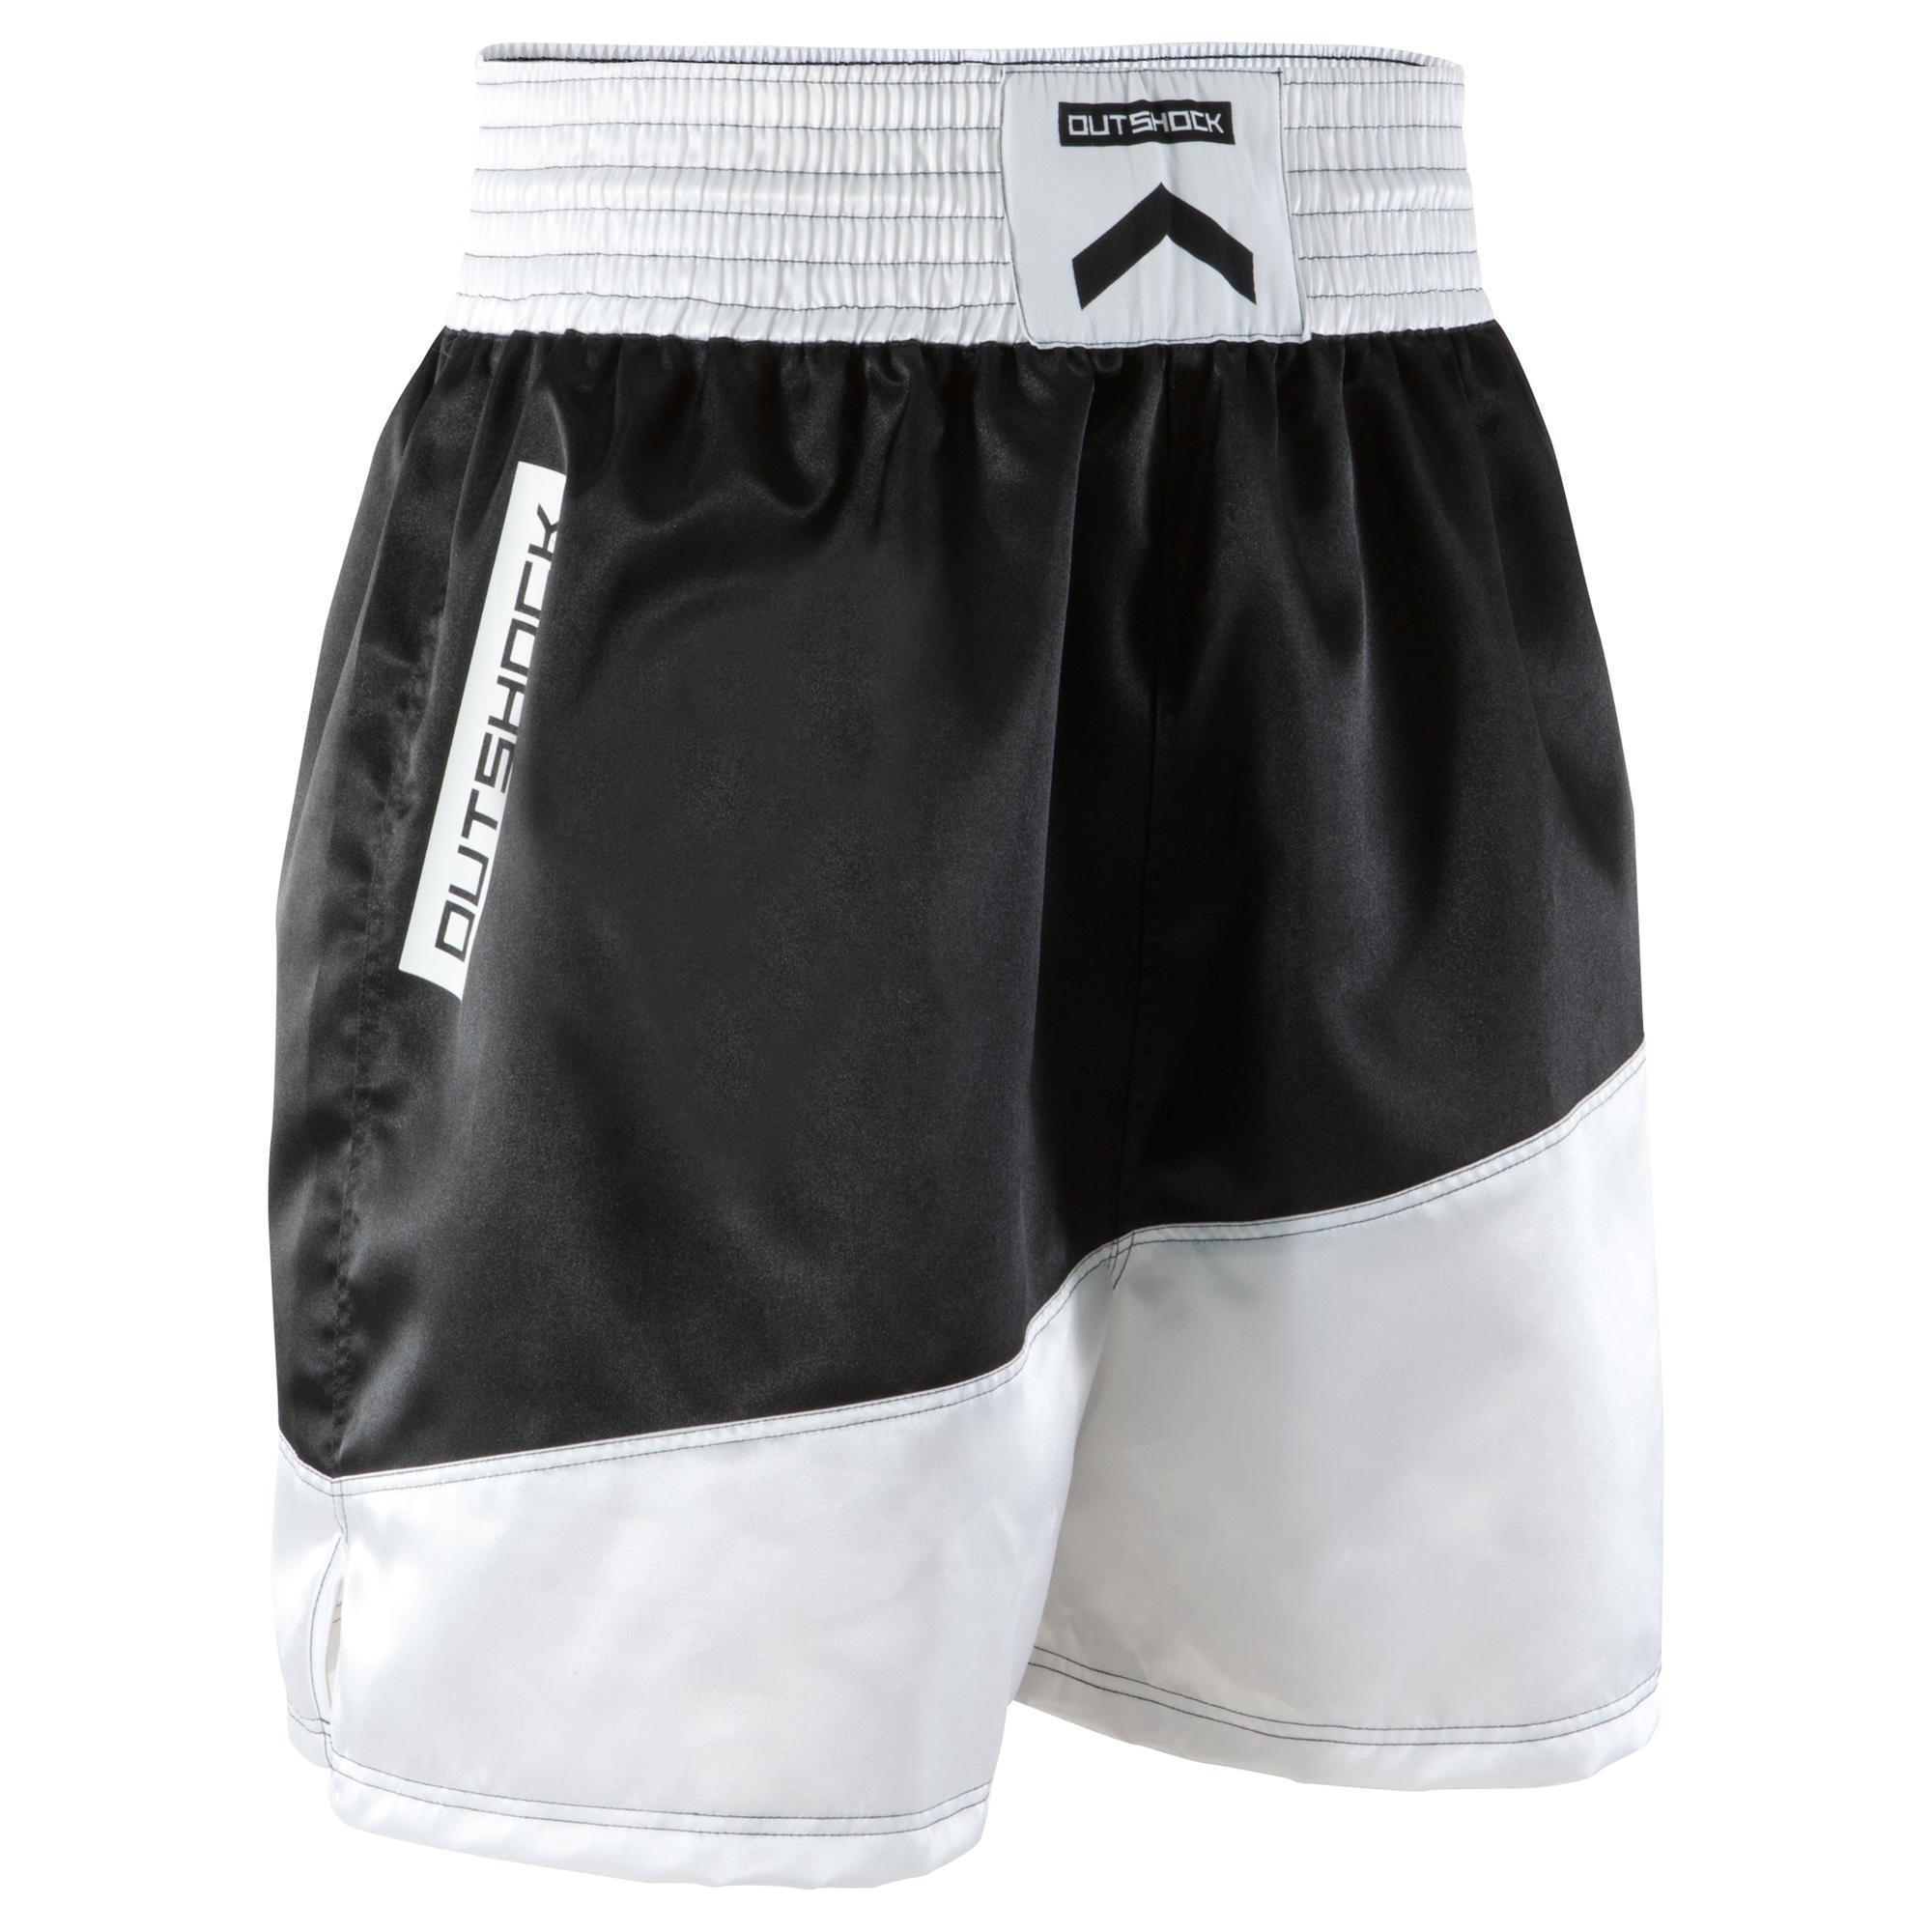 77a44091b12ed9 pantaloncini adidas decathlon - rymo.it